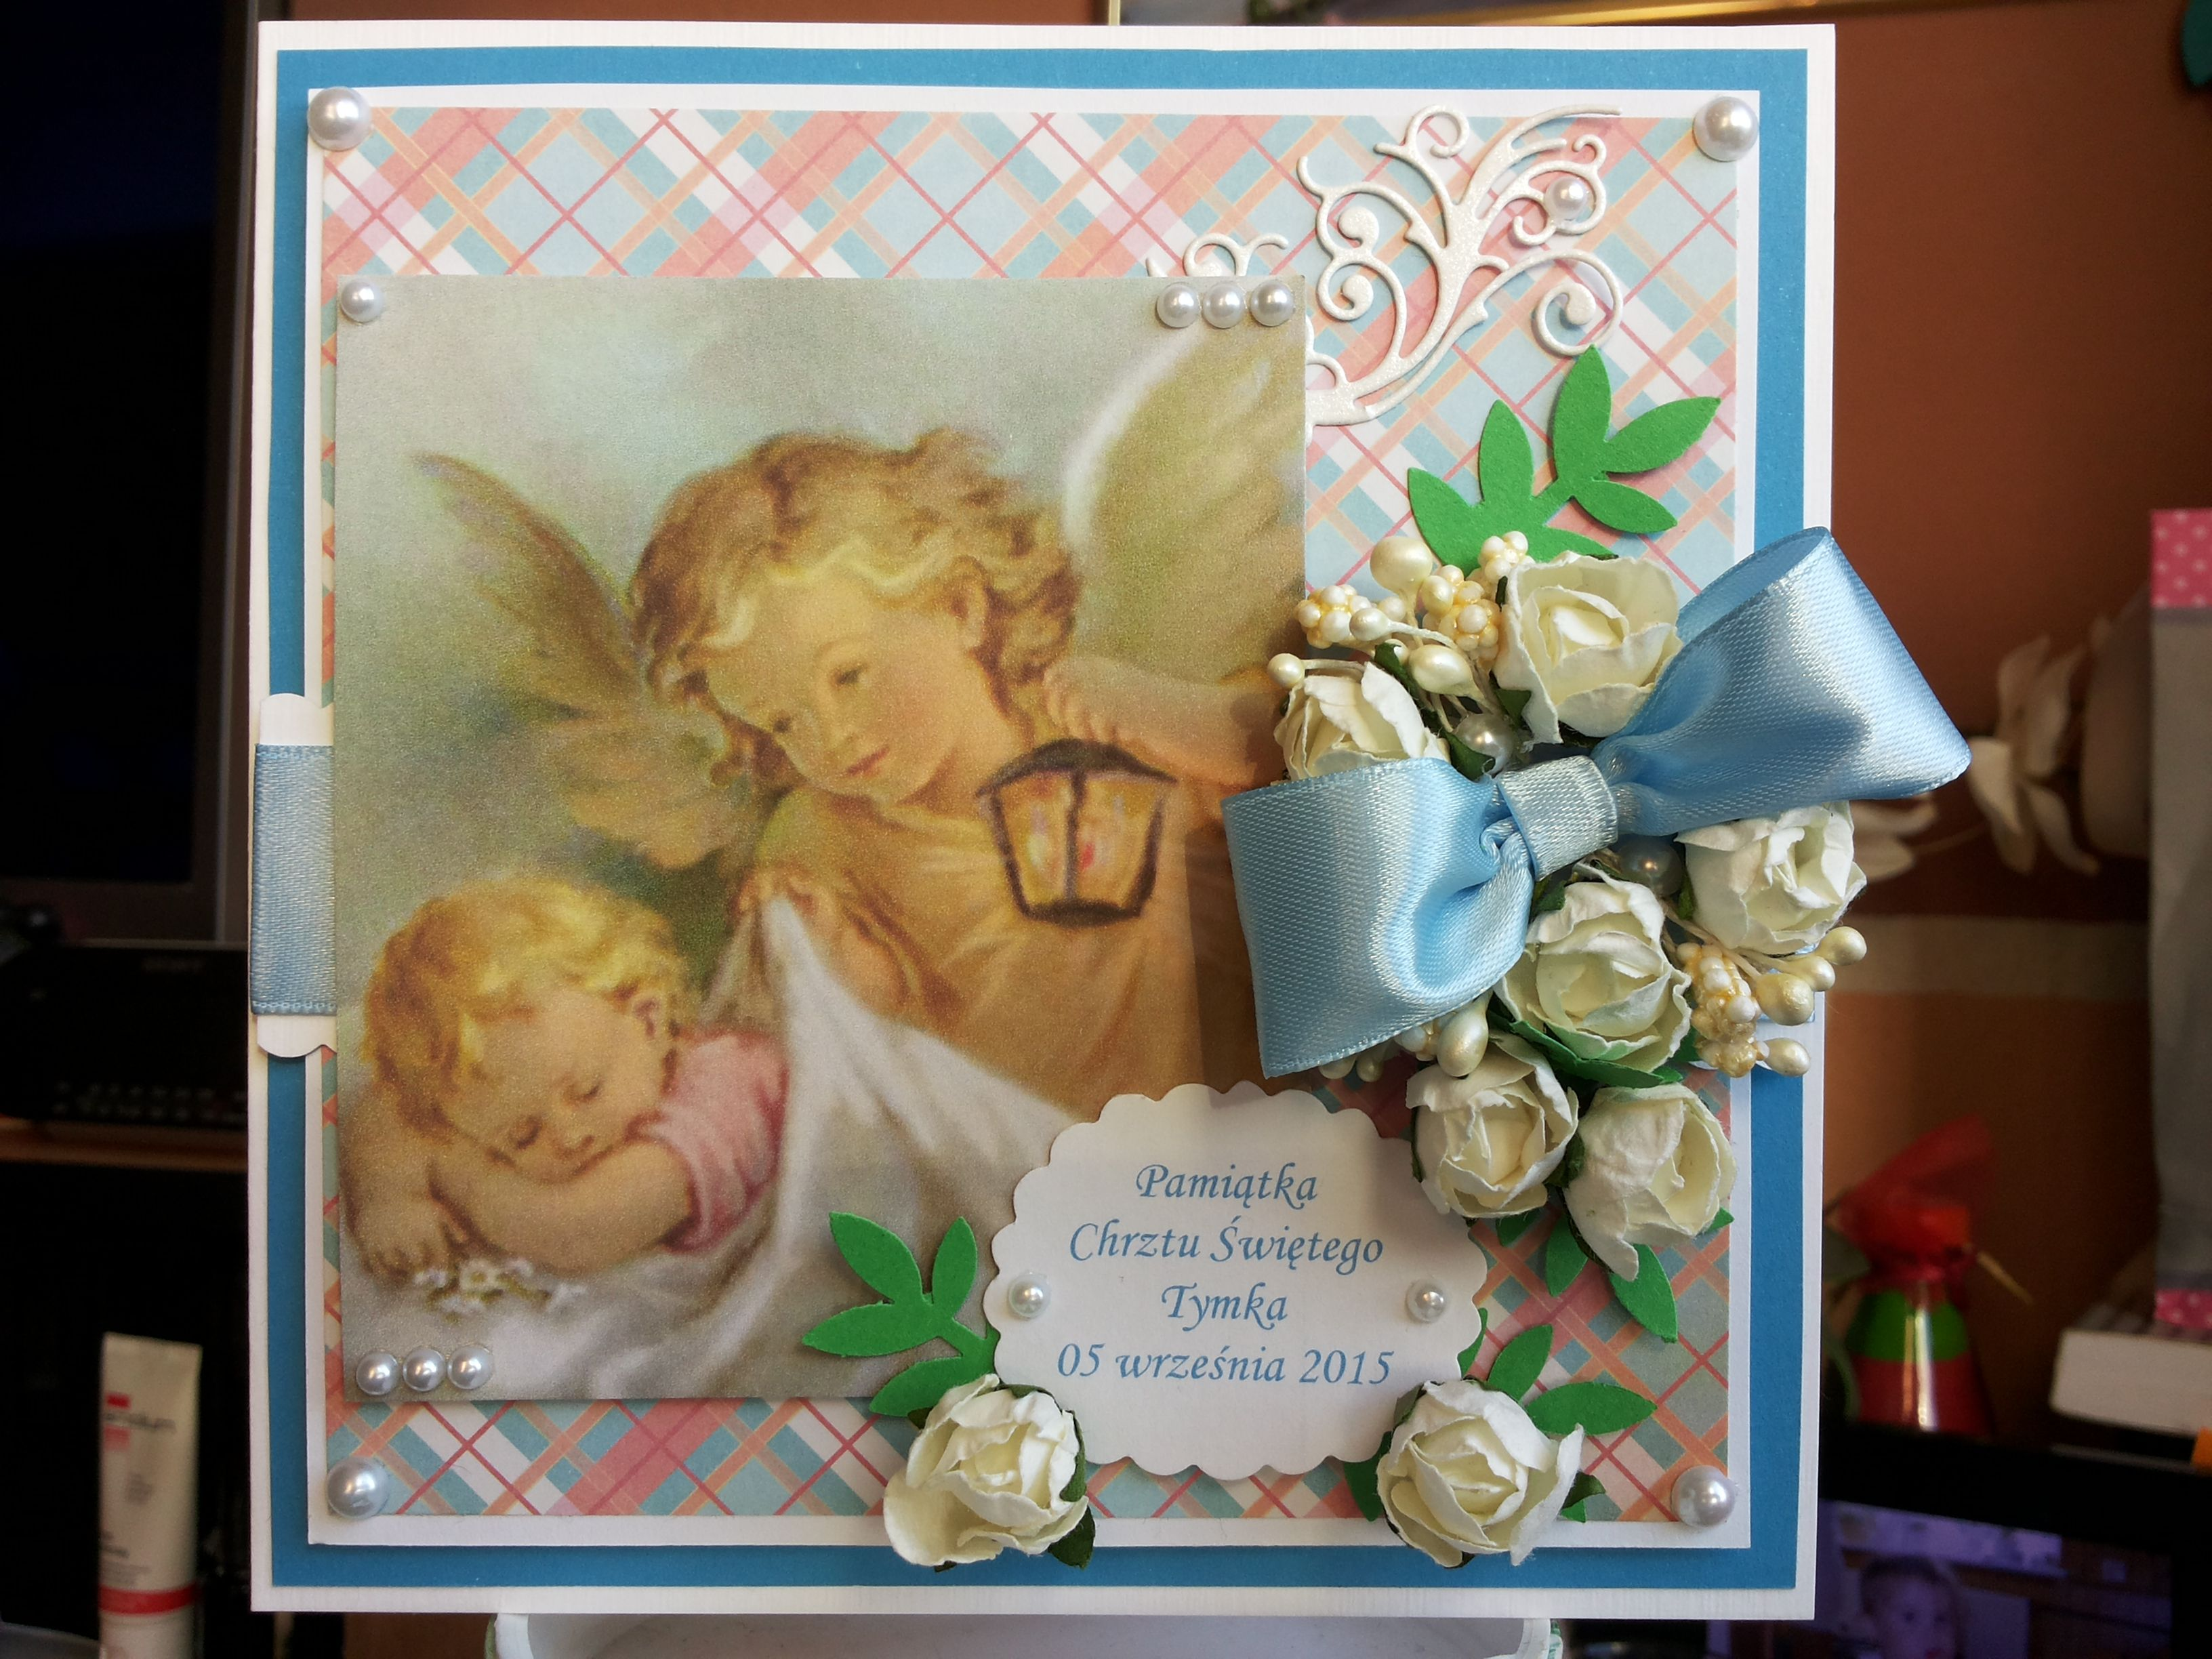 Pamiatka Chrztu Swietego A Reminder Of Baptism Cards